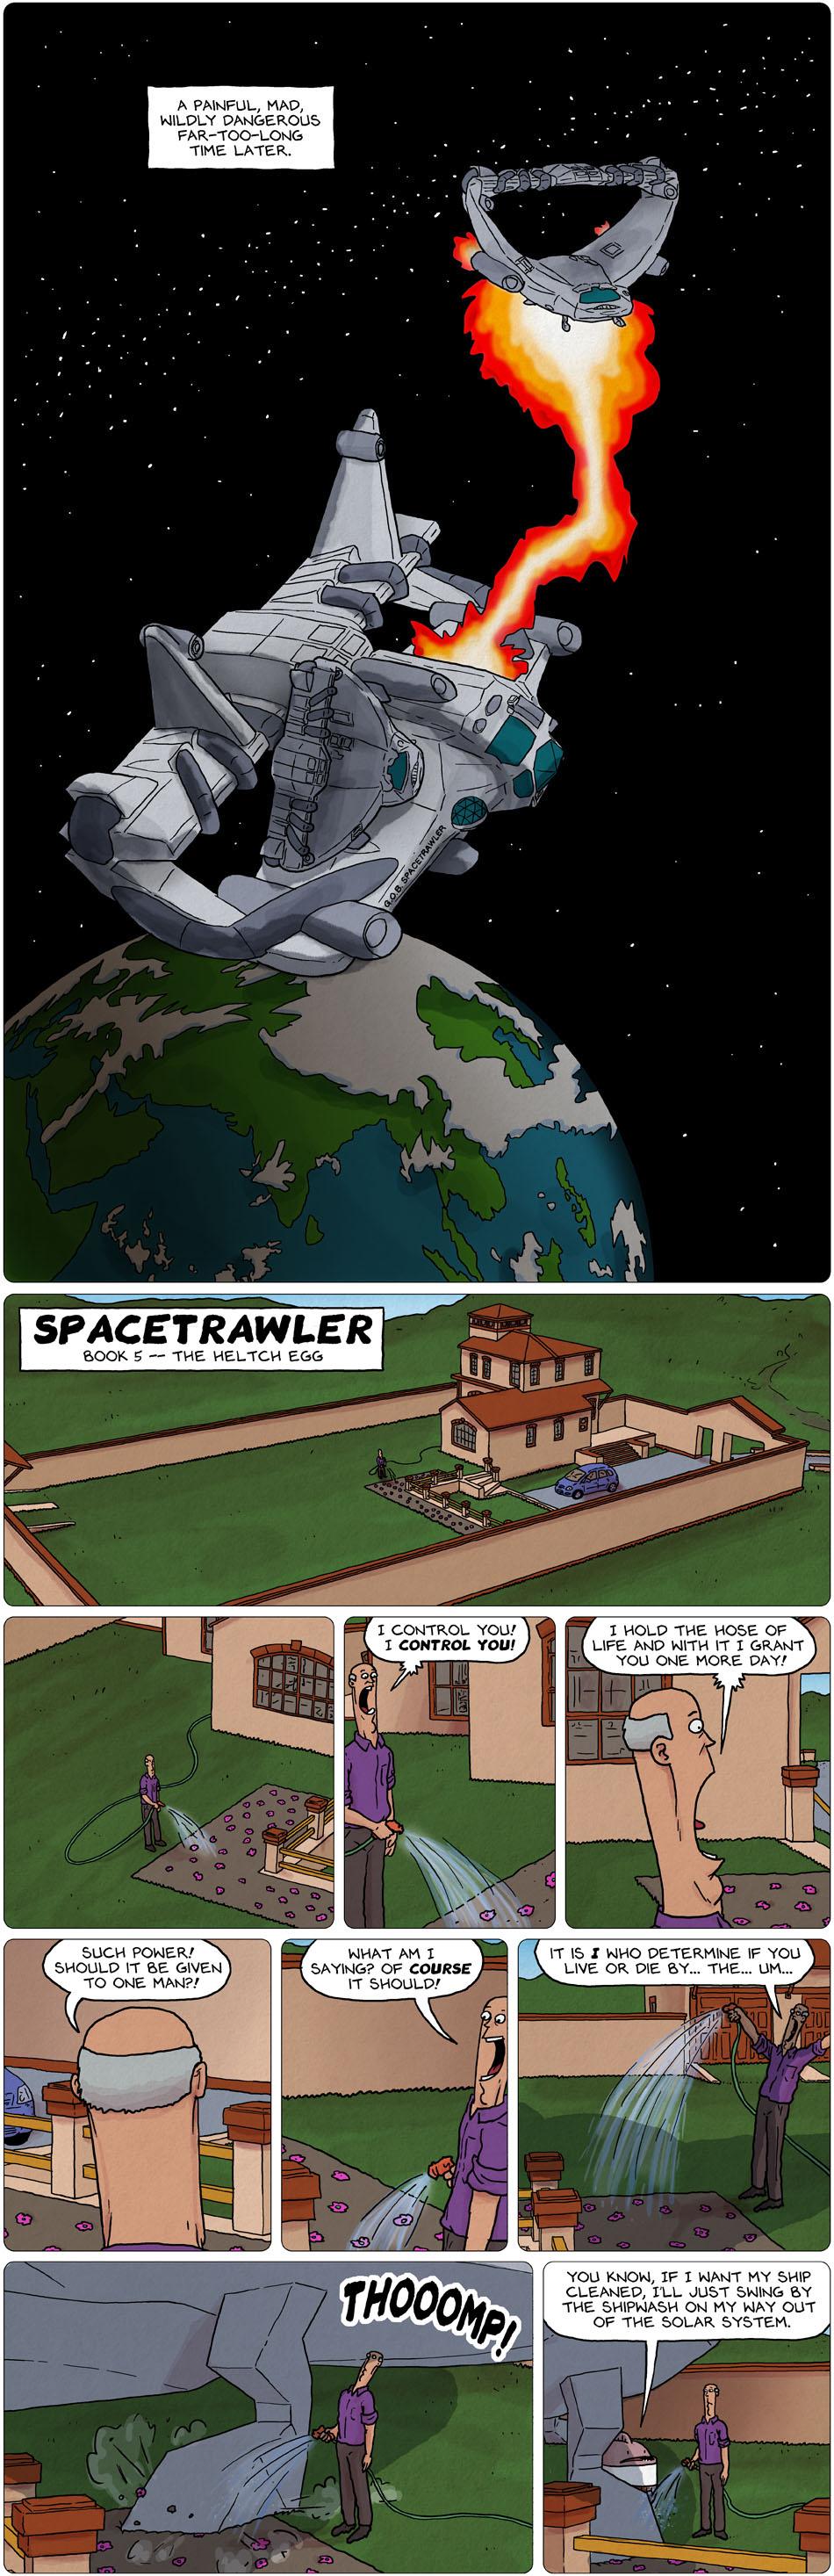 2016-08-24-spacetrawler5